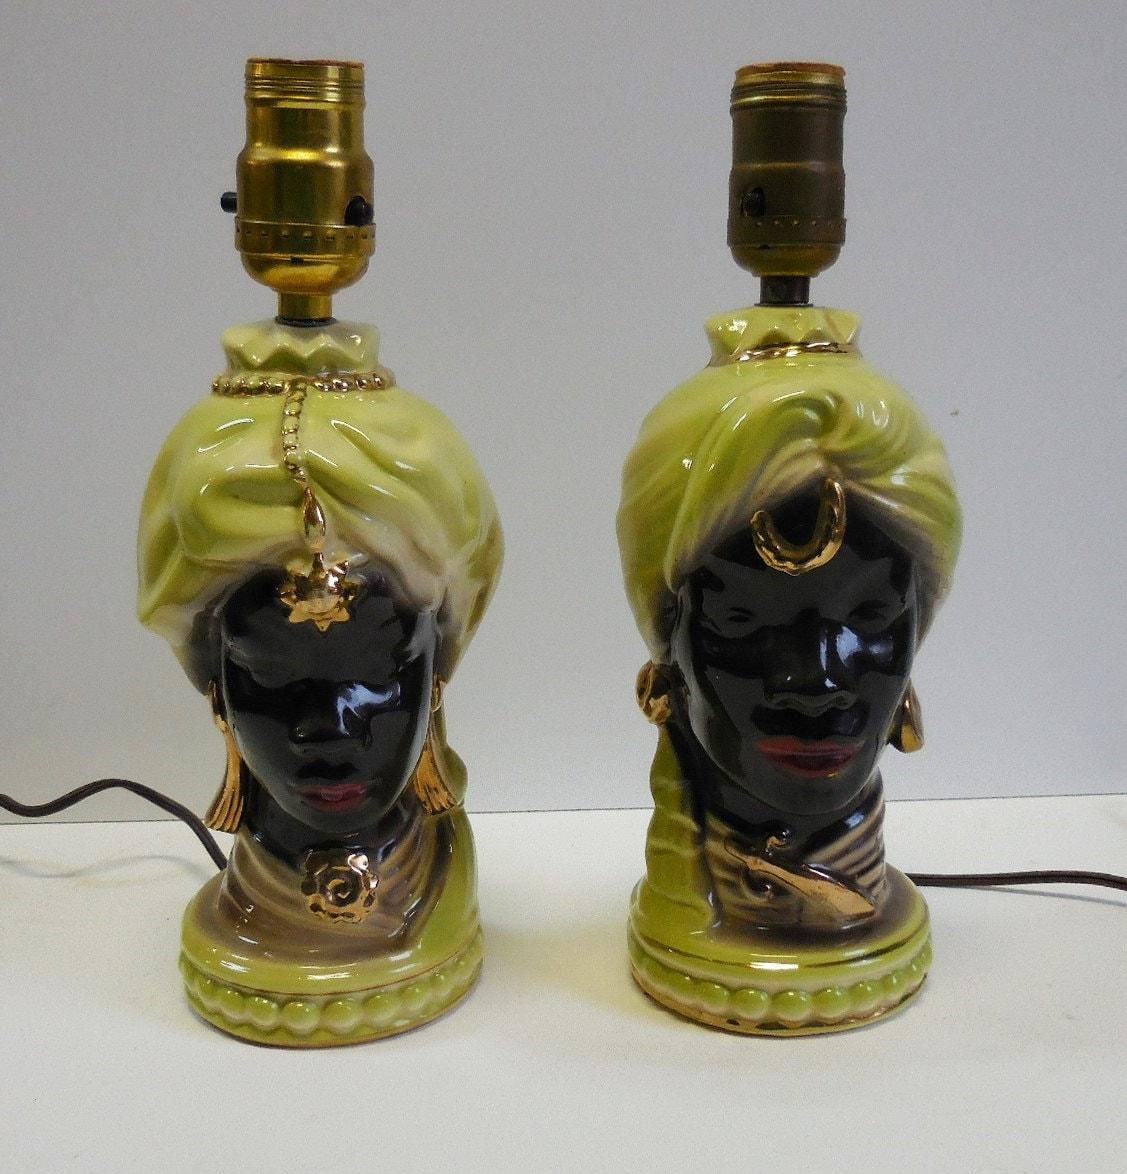 2 Vintage Lamps Figural Head Lights Black African American